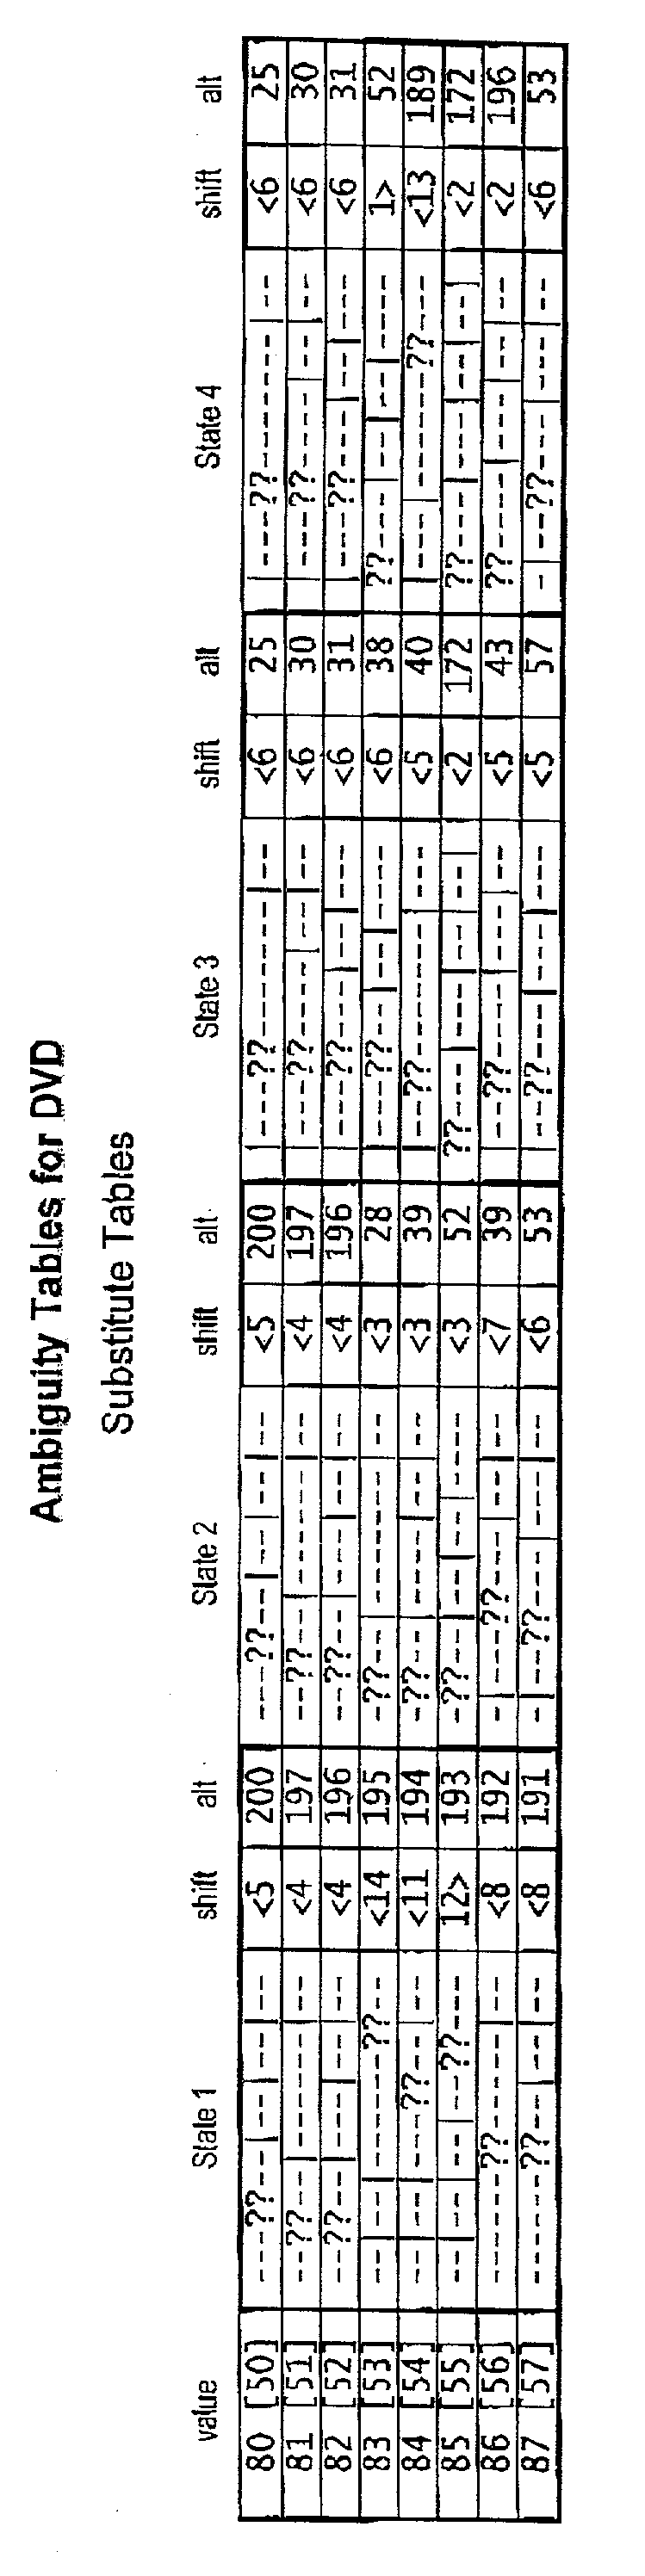 Figure US20020069389A1-20020606-P00011